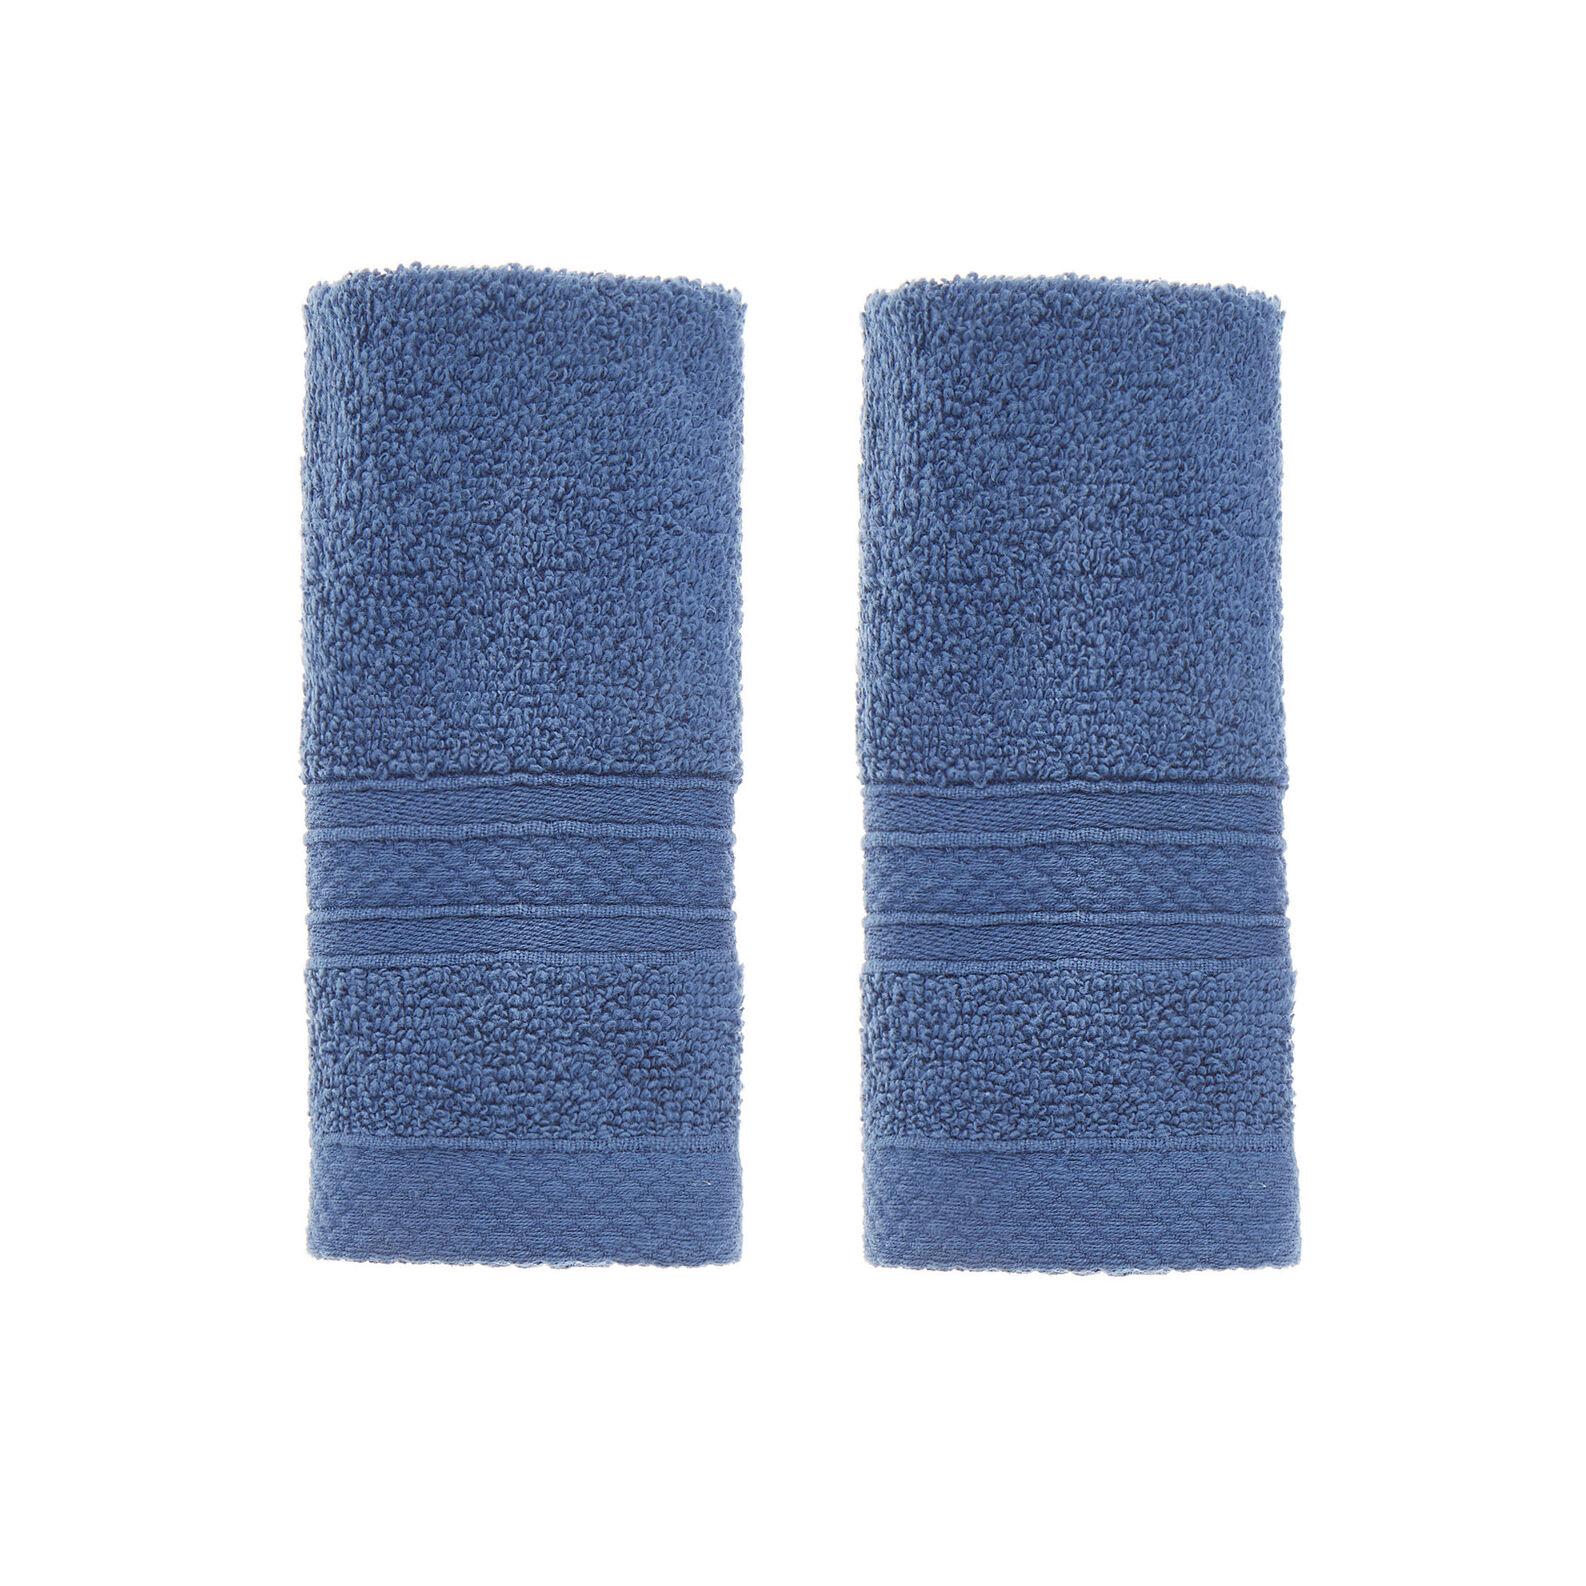 Set of solid colour cotton terry face cloths